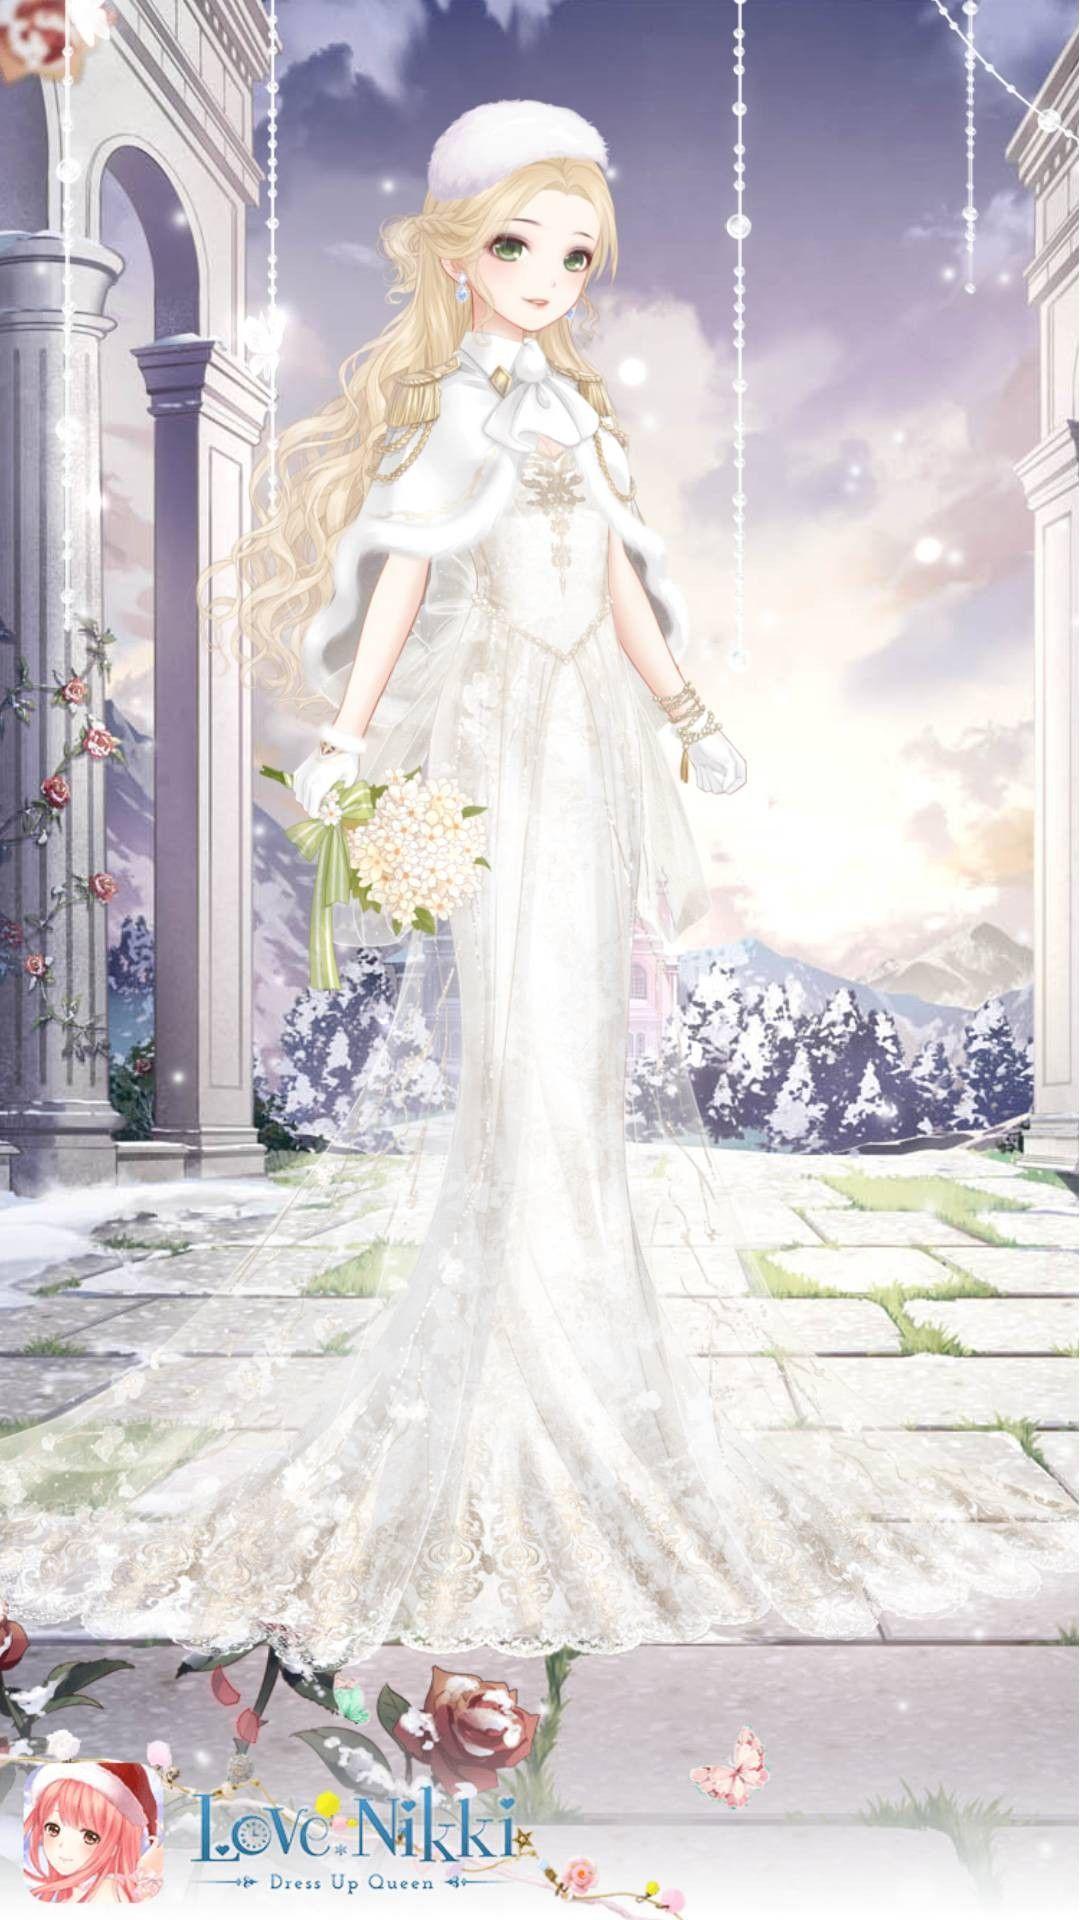 Winter wedding dress Wedding dress drawings, Anime dress